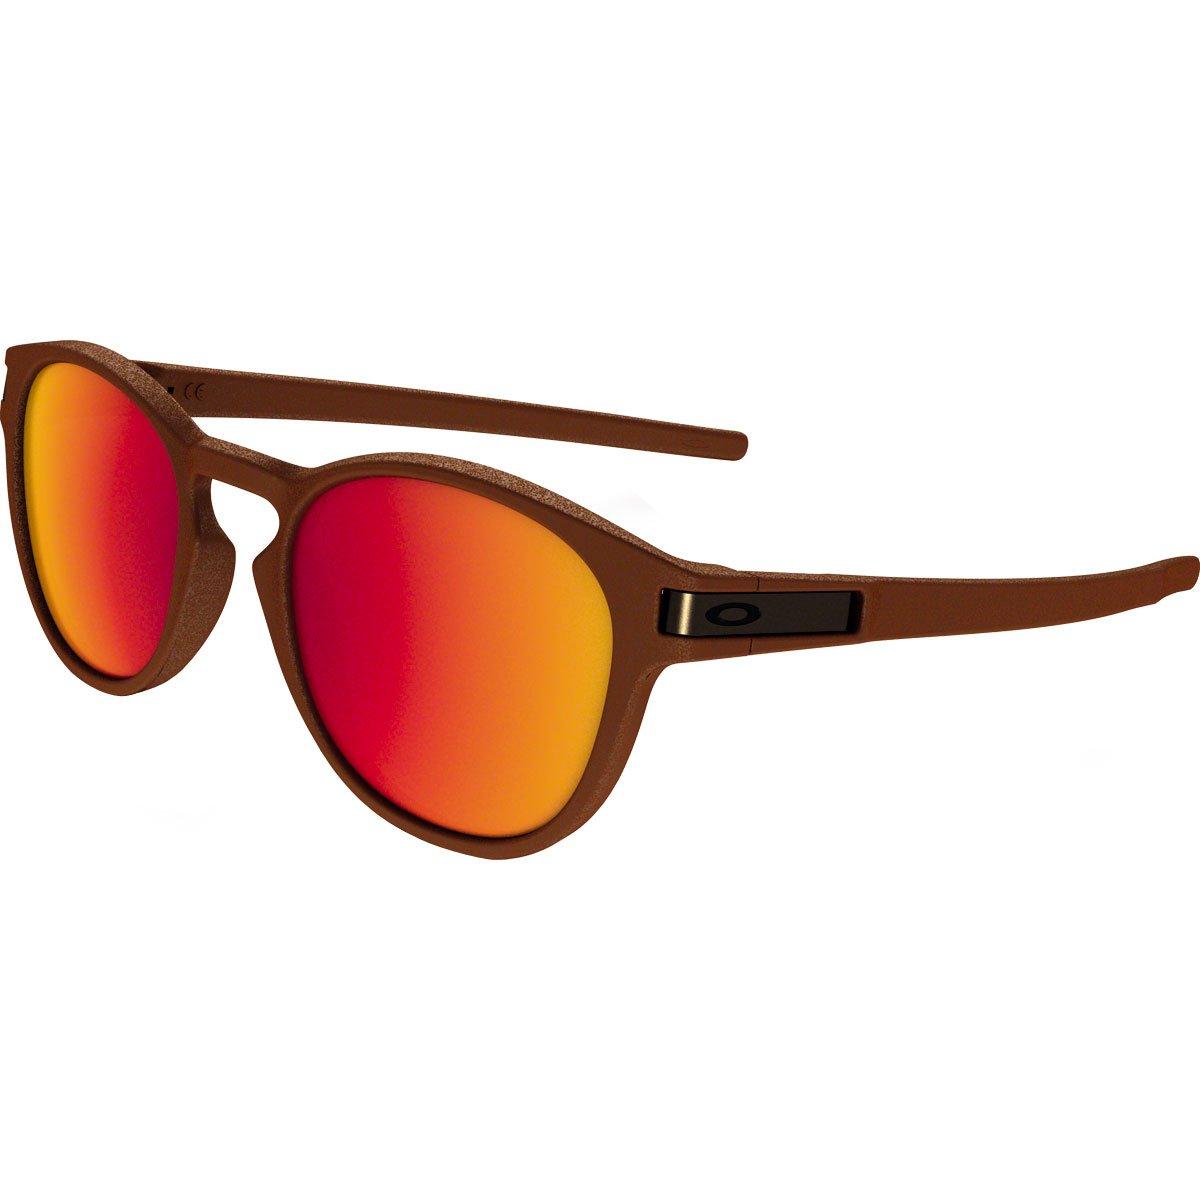 Oakley Adult Latch Sunglasses, Corten/Torch Iridium, One Size